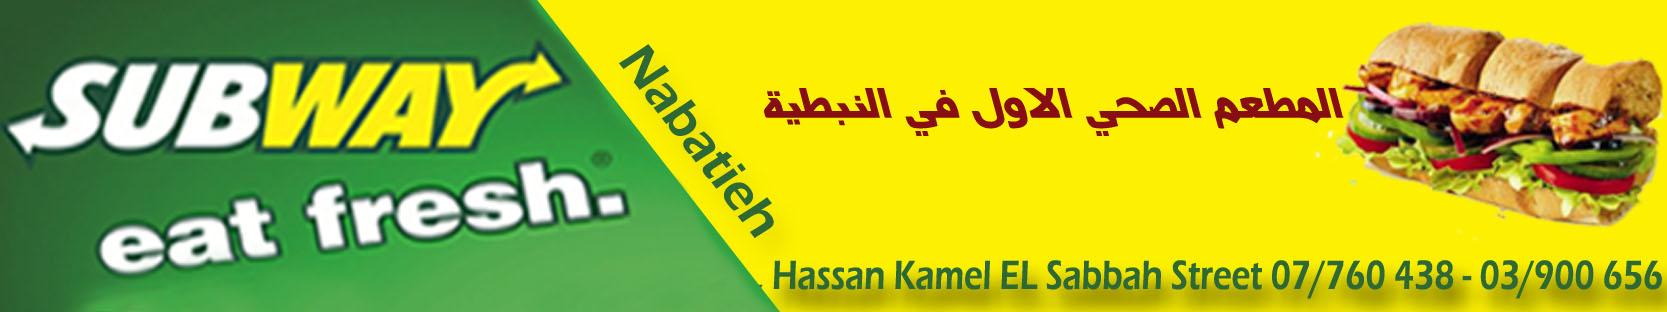 nabatieh.org/news.php?go=fullnews&newsid=8968